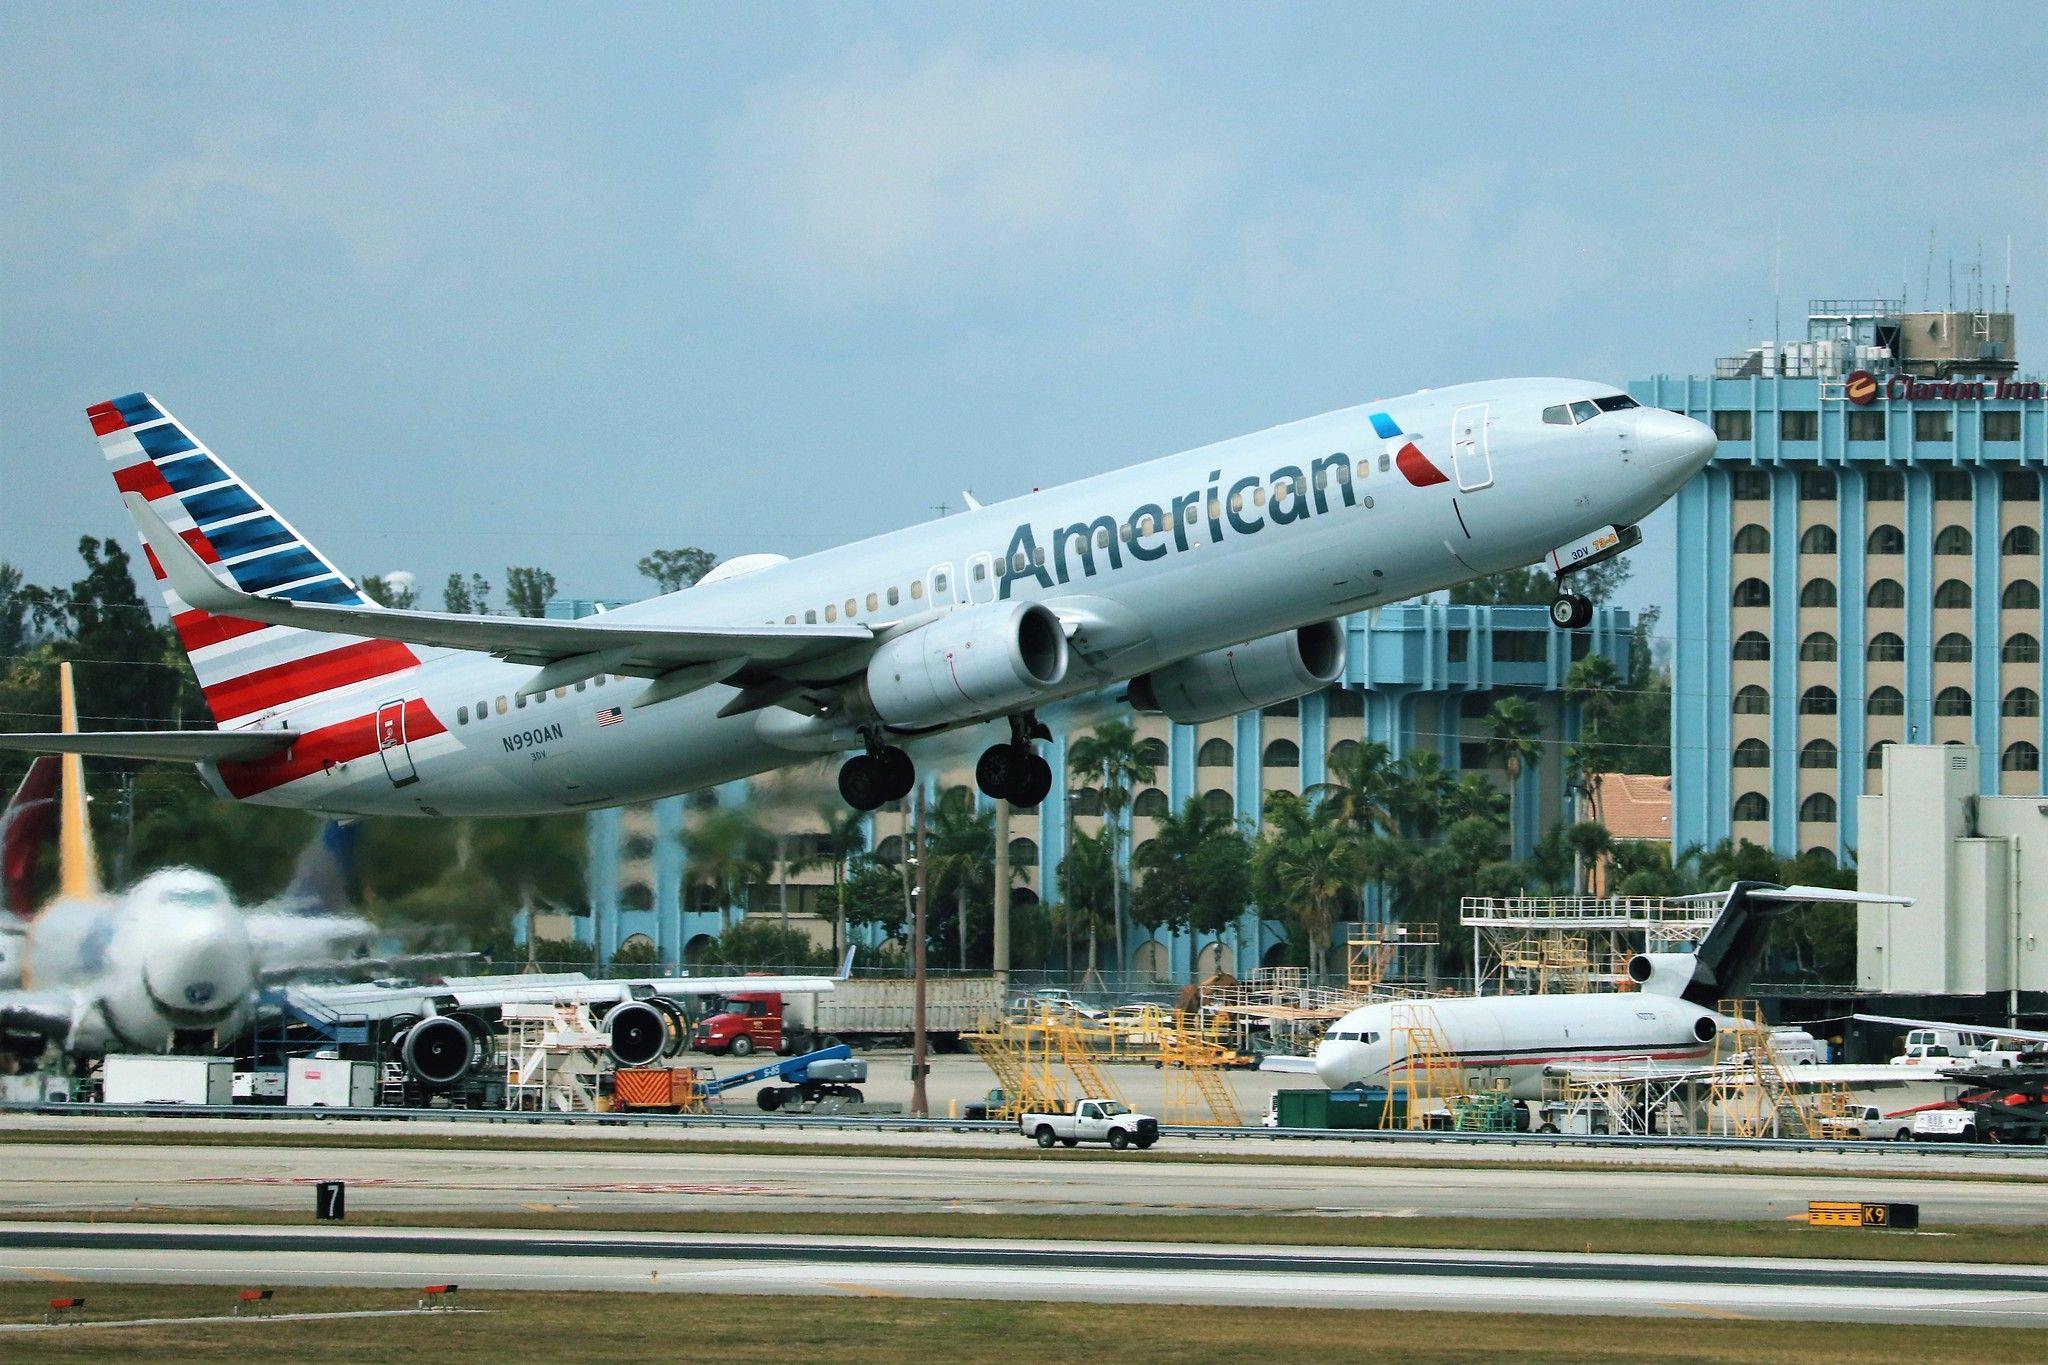 American Airlines 737 American airlines, American, Airlines